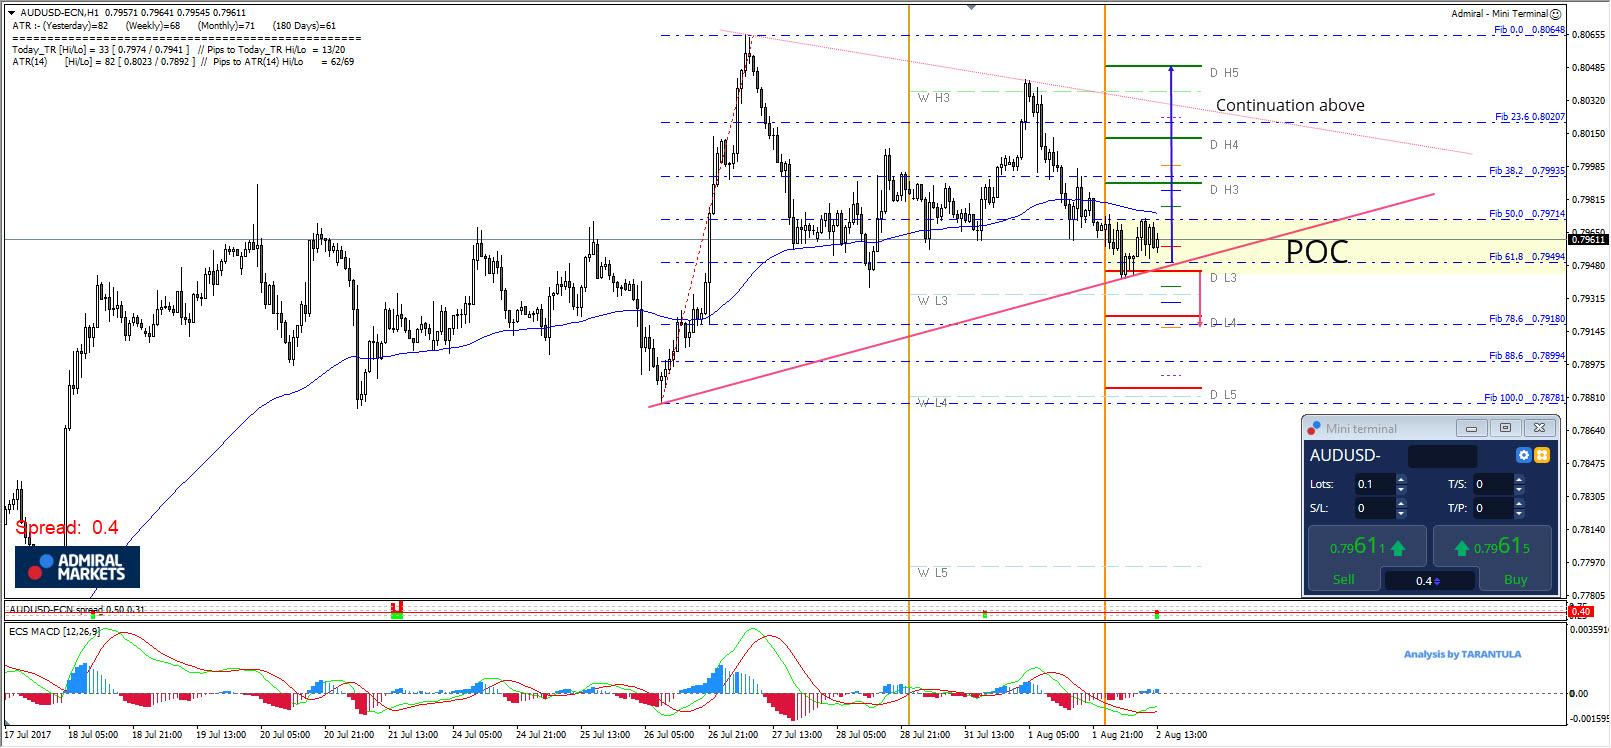 AUD/USD Bullish POC Zone Should Provide Continuation